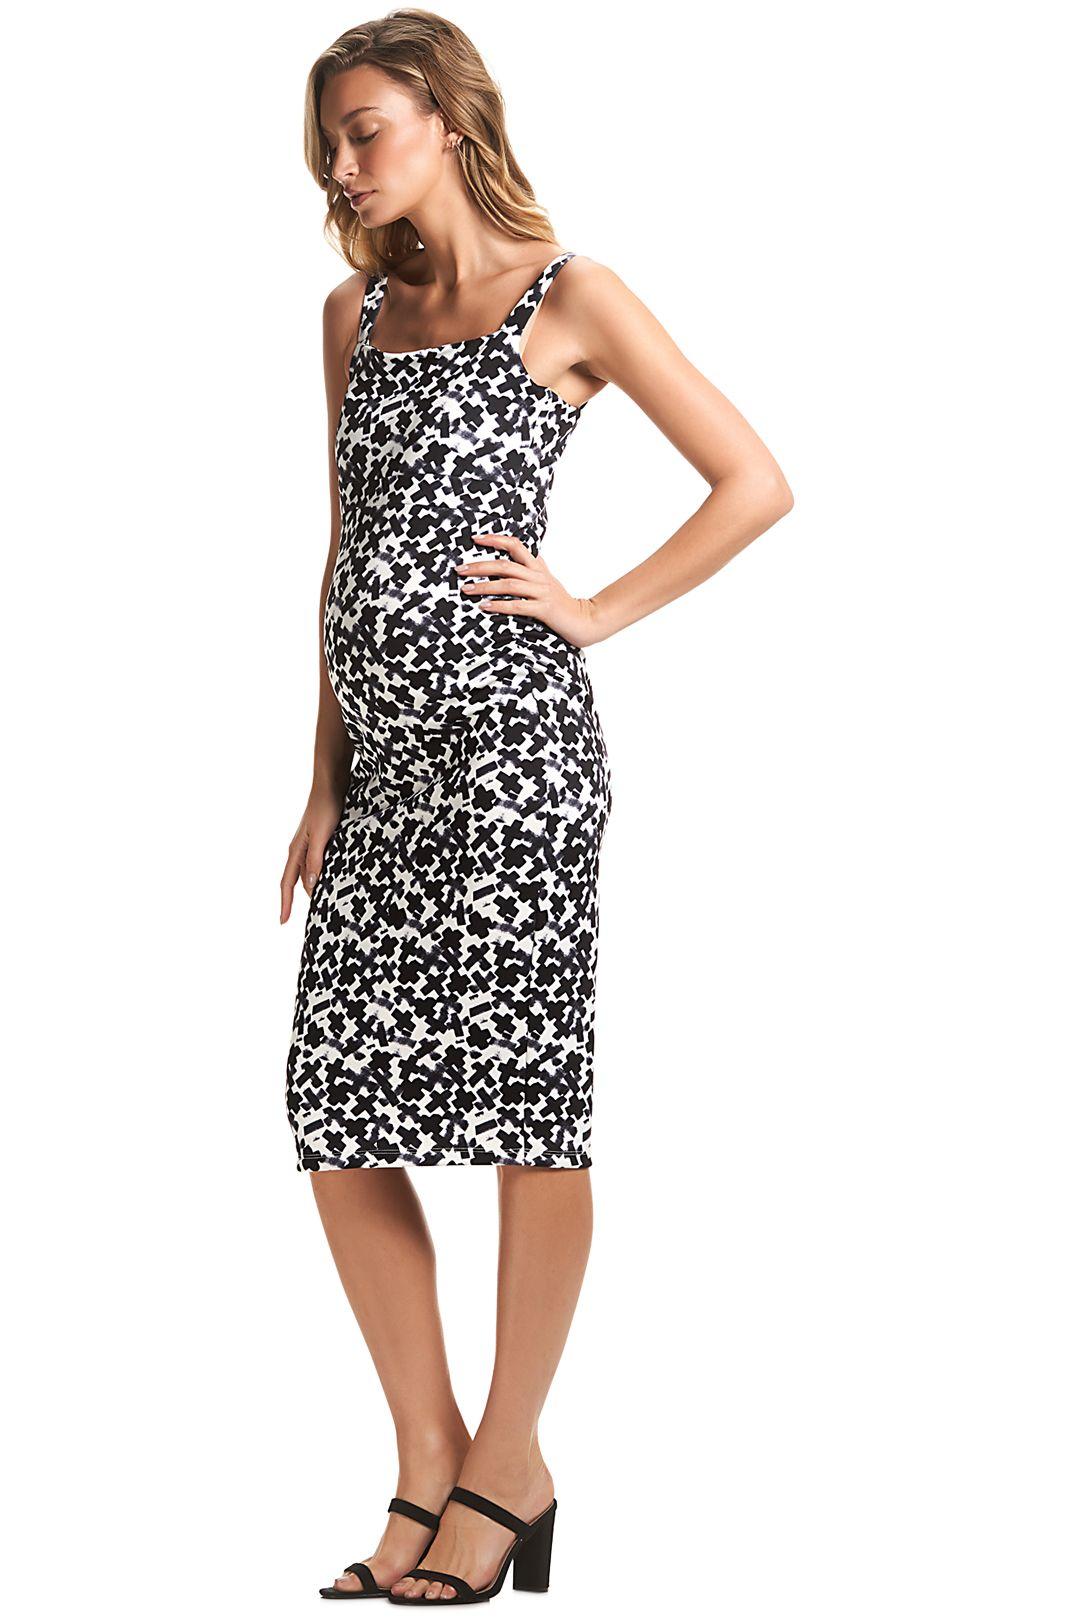 Soon-Maternity-Rosie-Dress-Black-White-Side